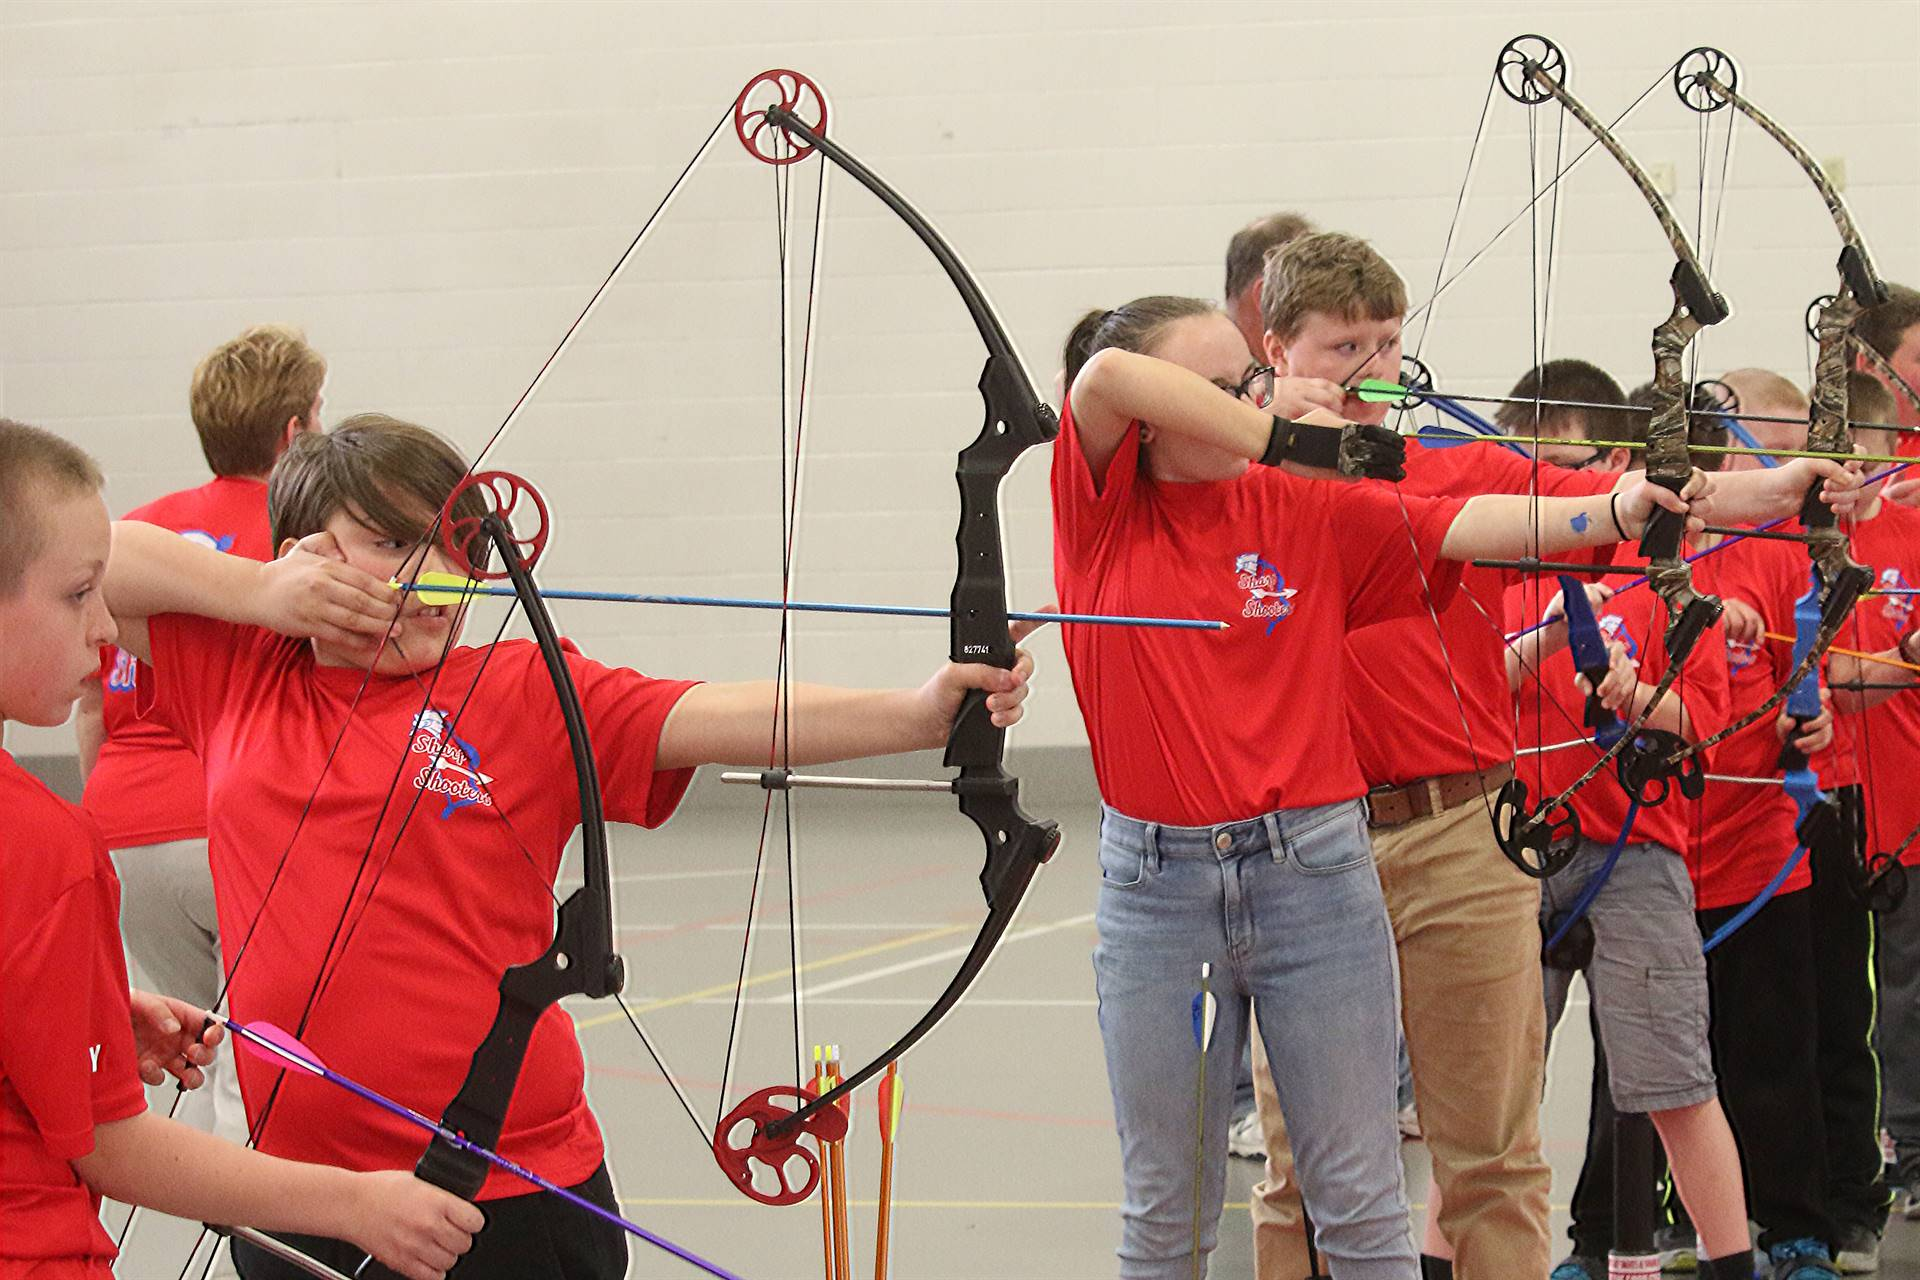 archers practice